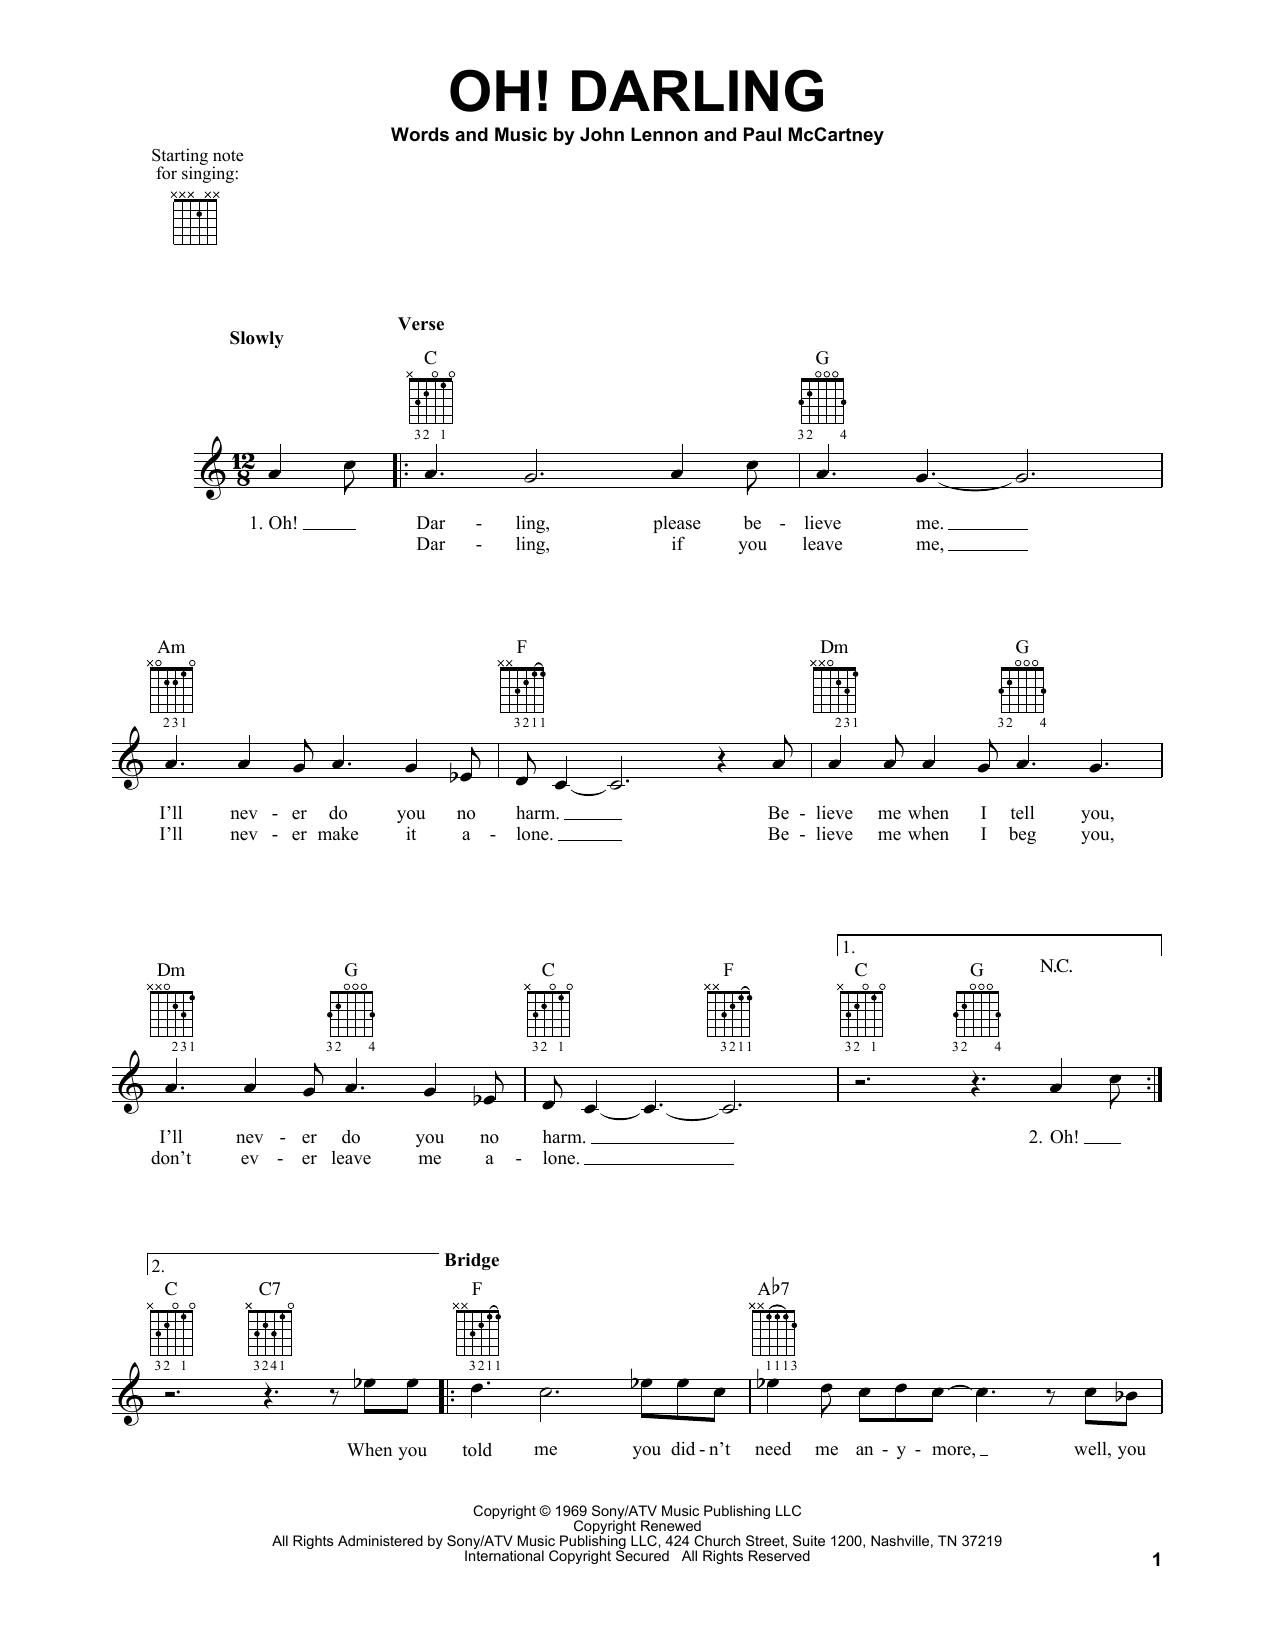 The Beatles 'Oh! Darling' Sheet Music Notes, Chords   Download Printable  Easy Guitar - SKU: 161803